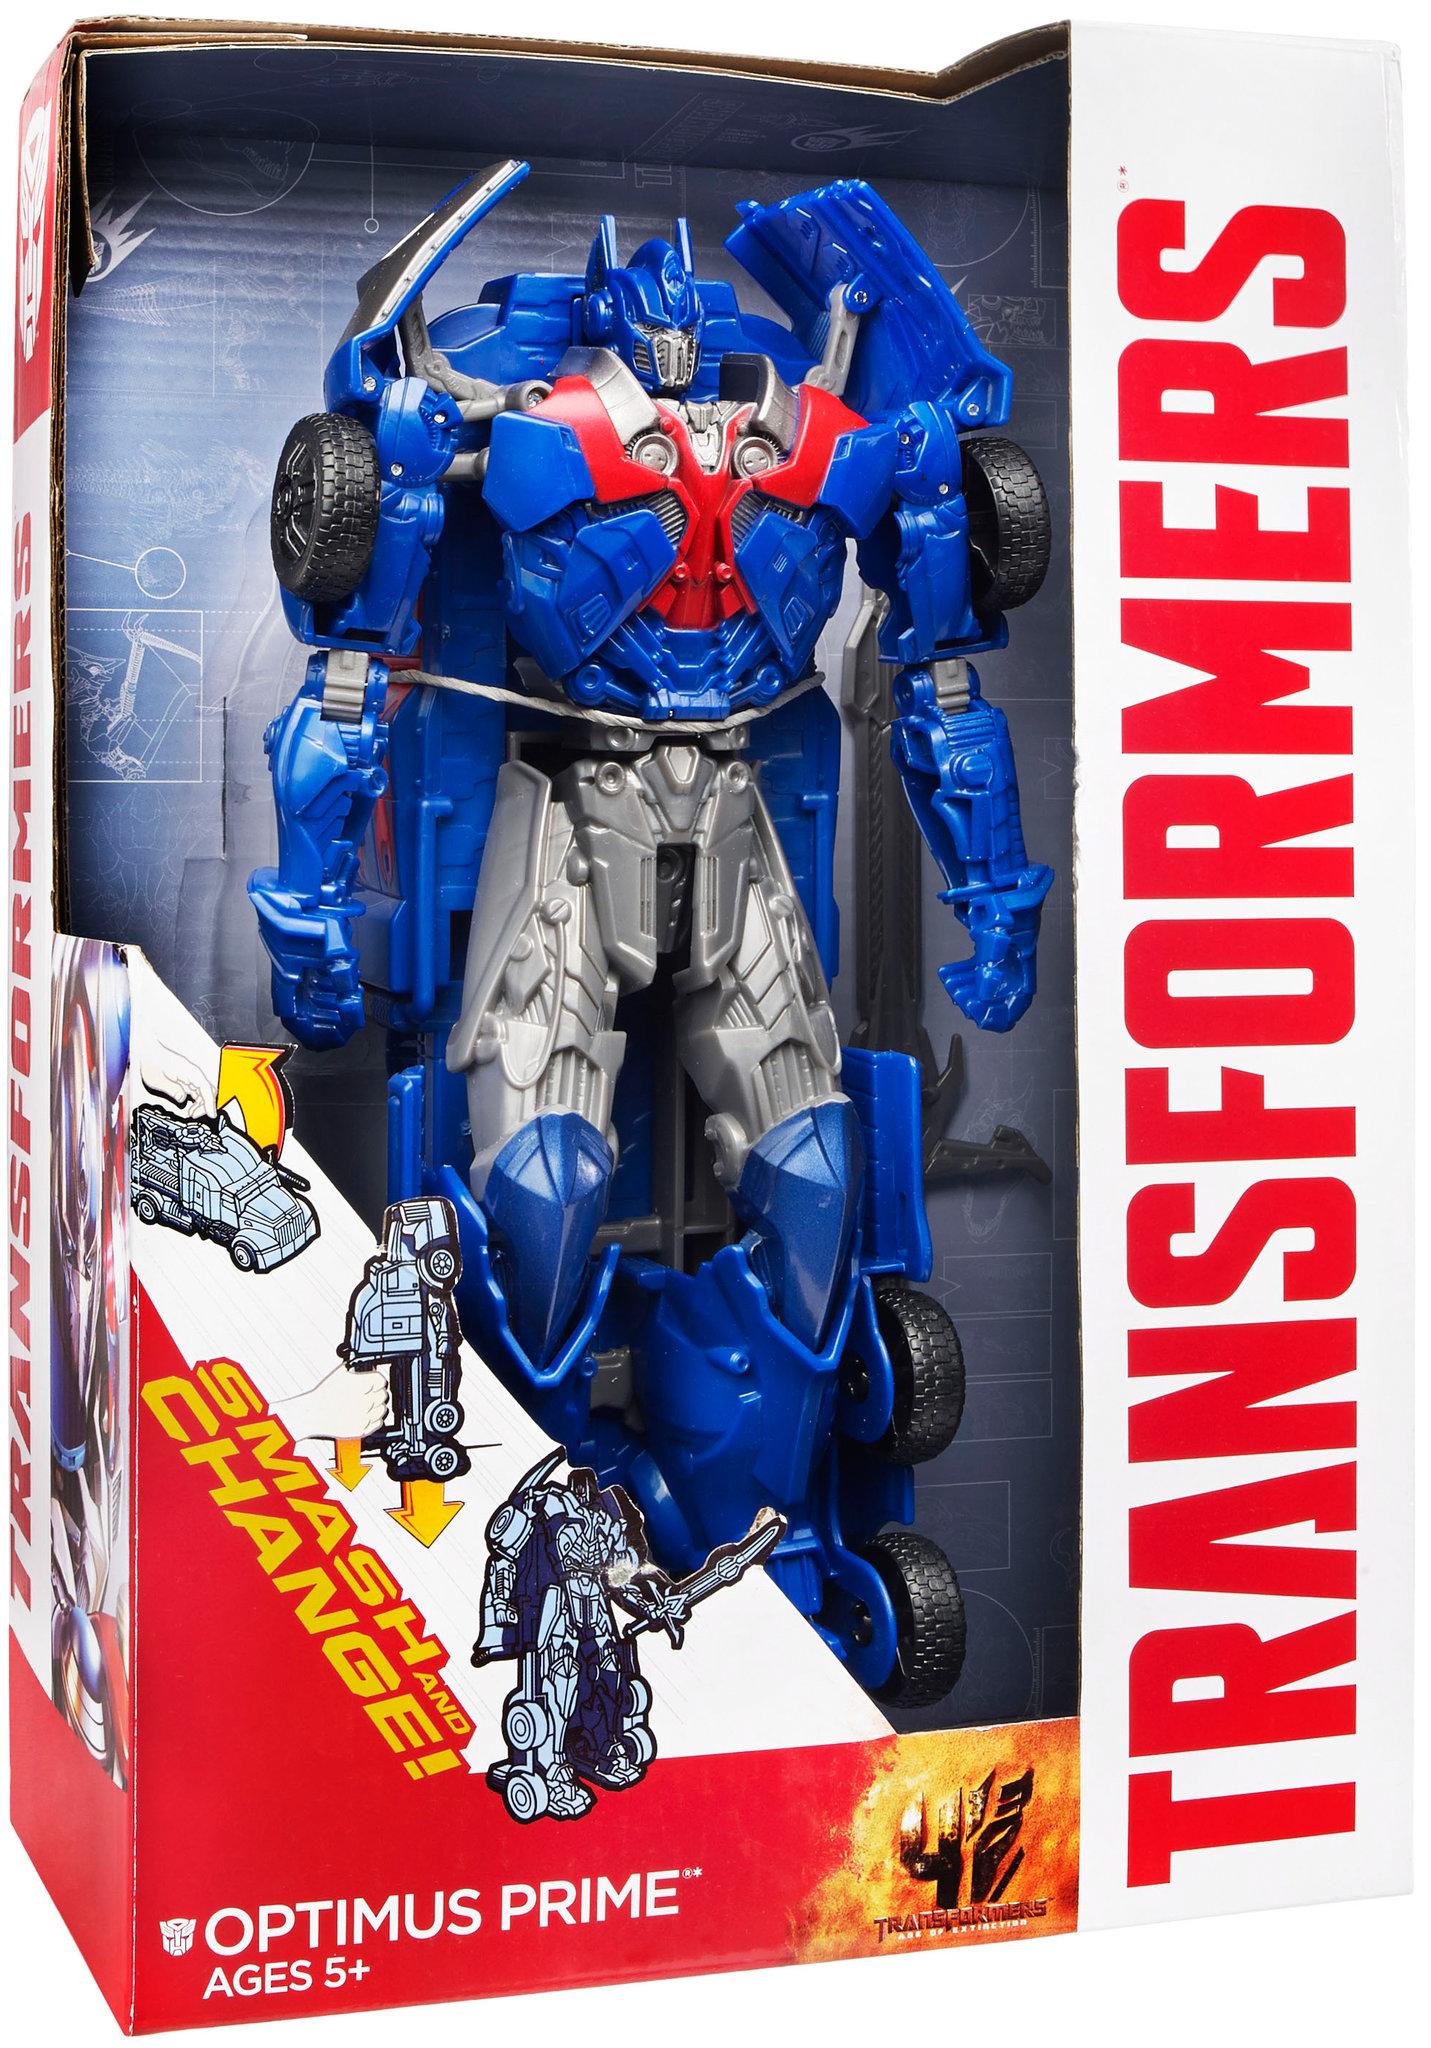 JOUETS - Transformers 4: Age Of Extinction - Page 3 Smash-change-optimus-prime_1390184175